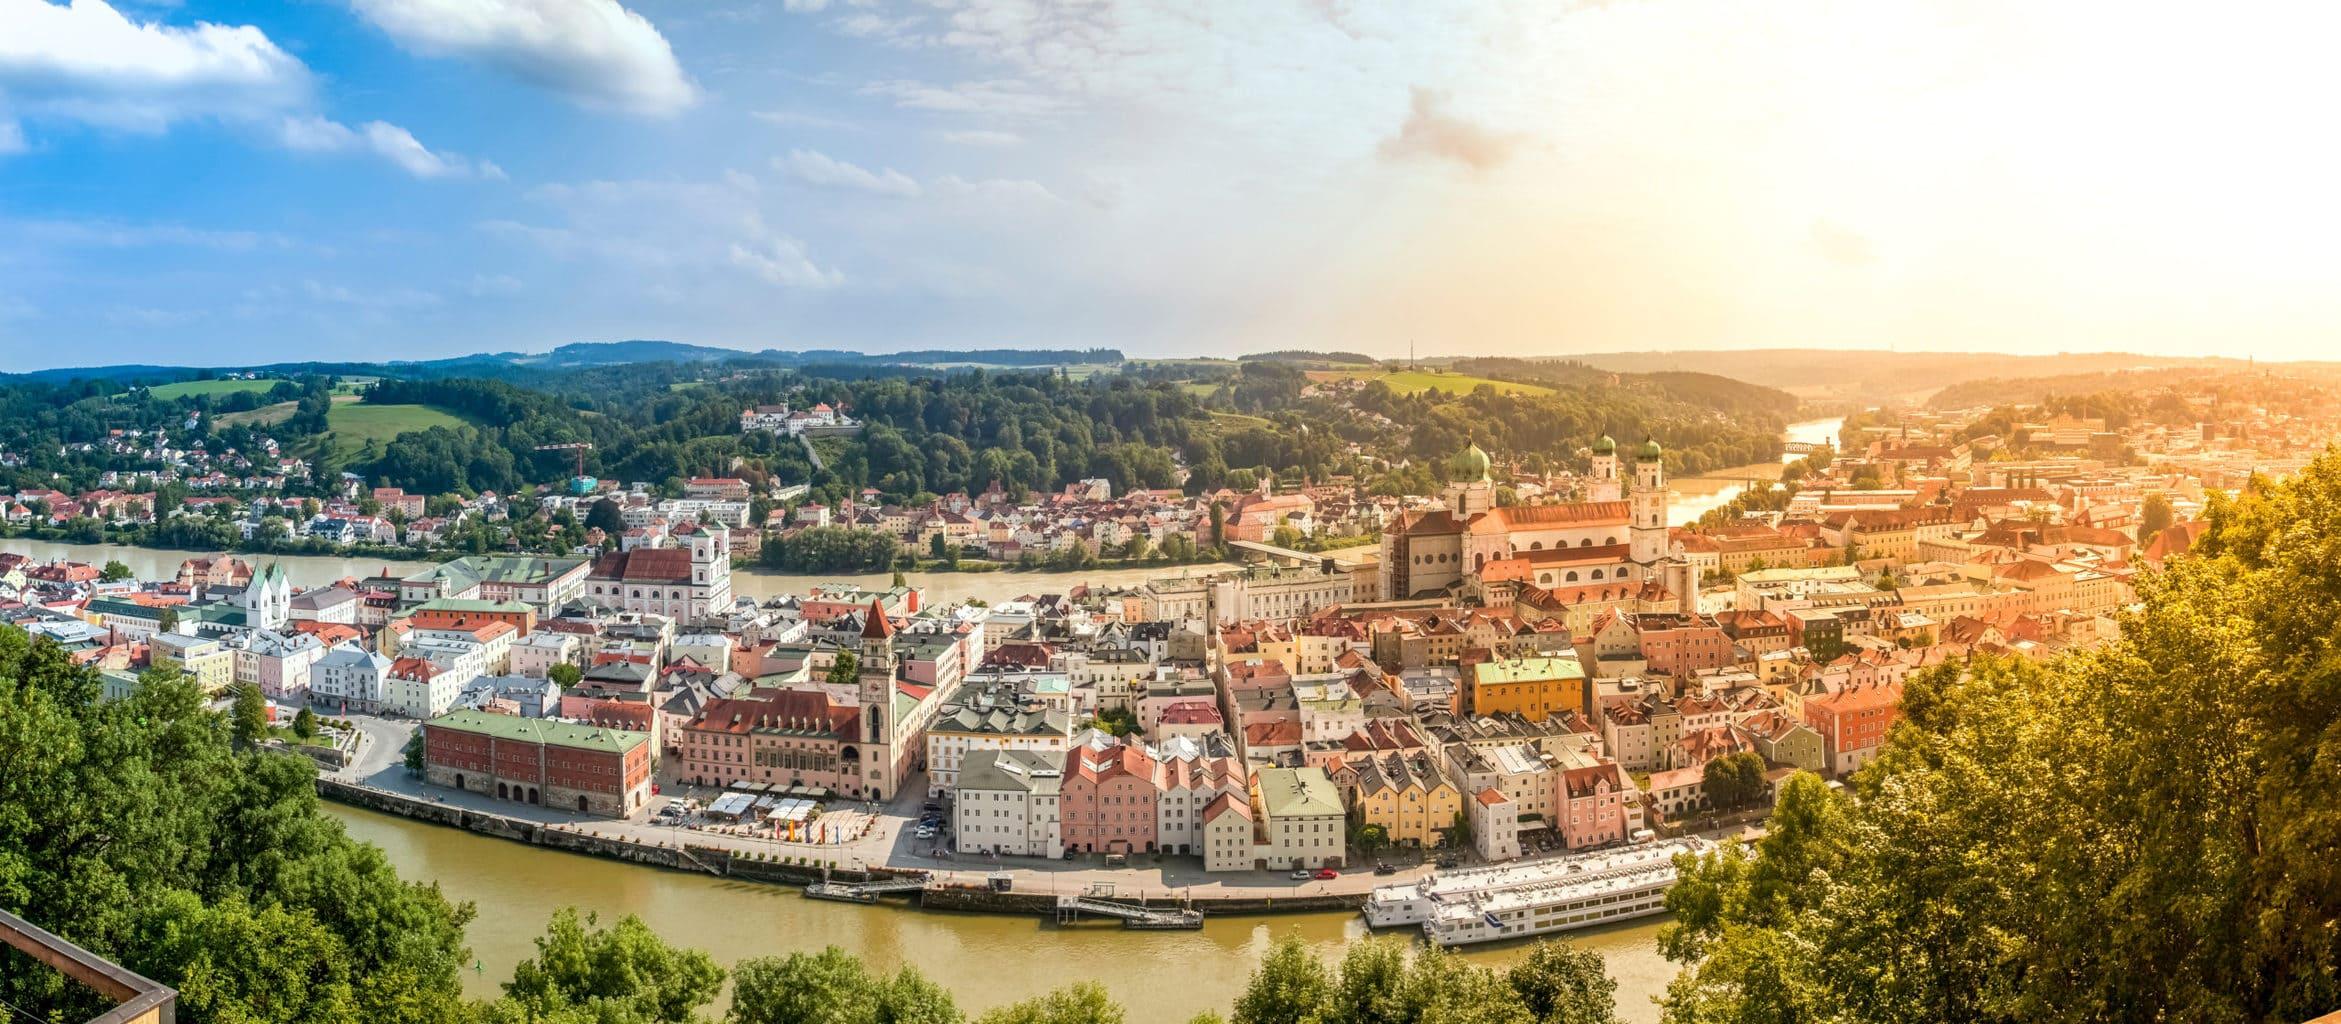 Stadsgezicht van Passau luchtopname